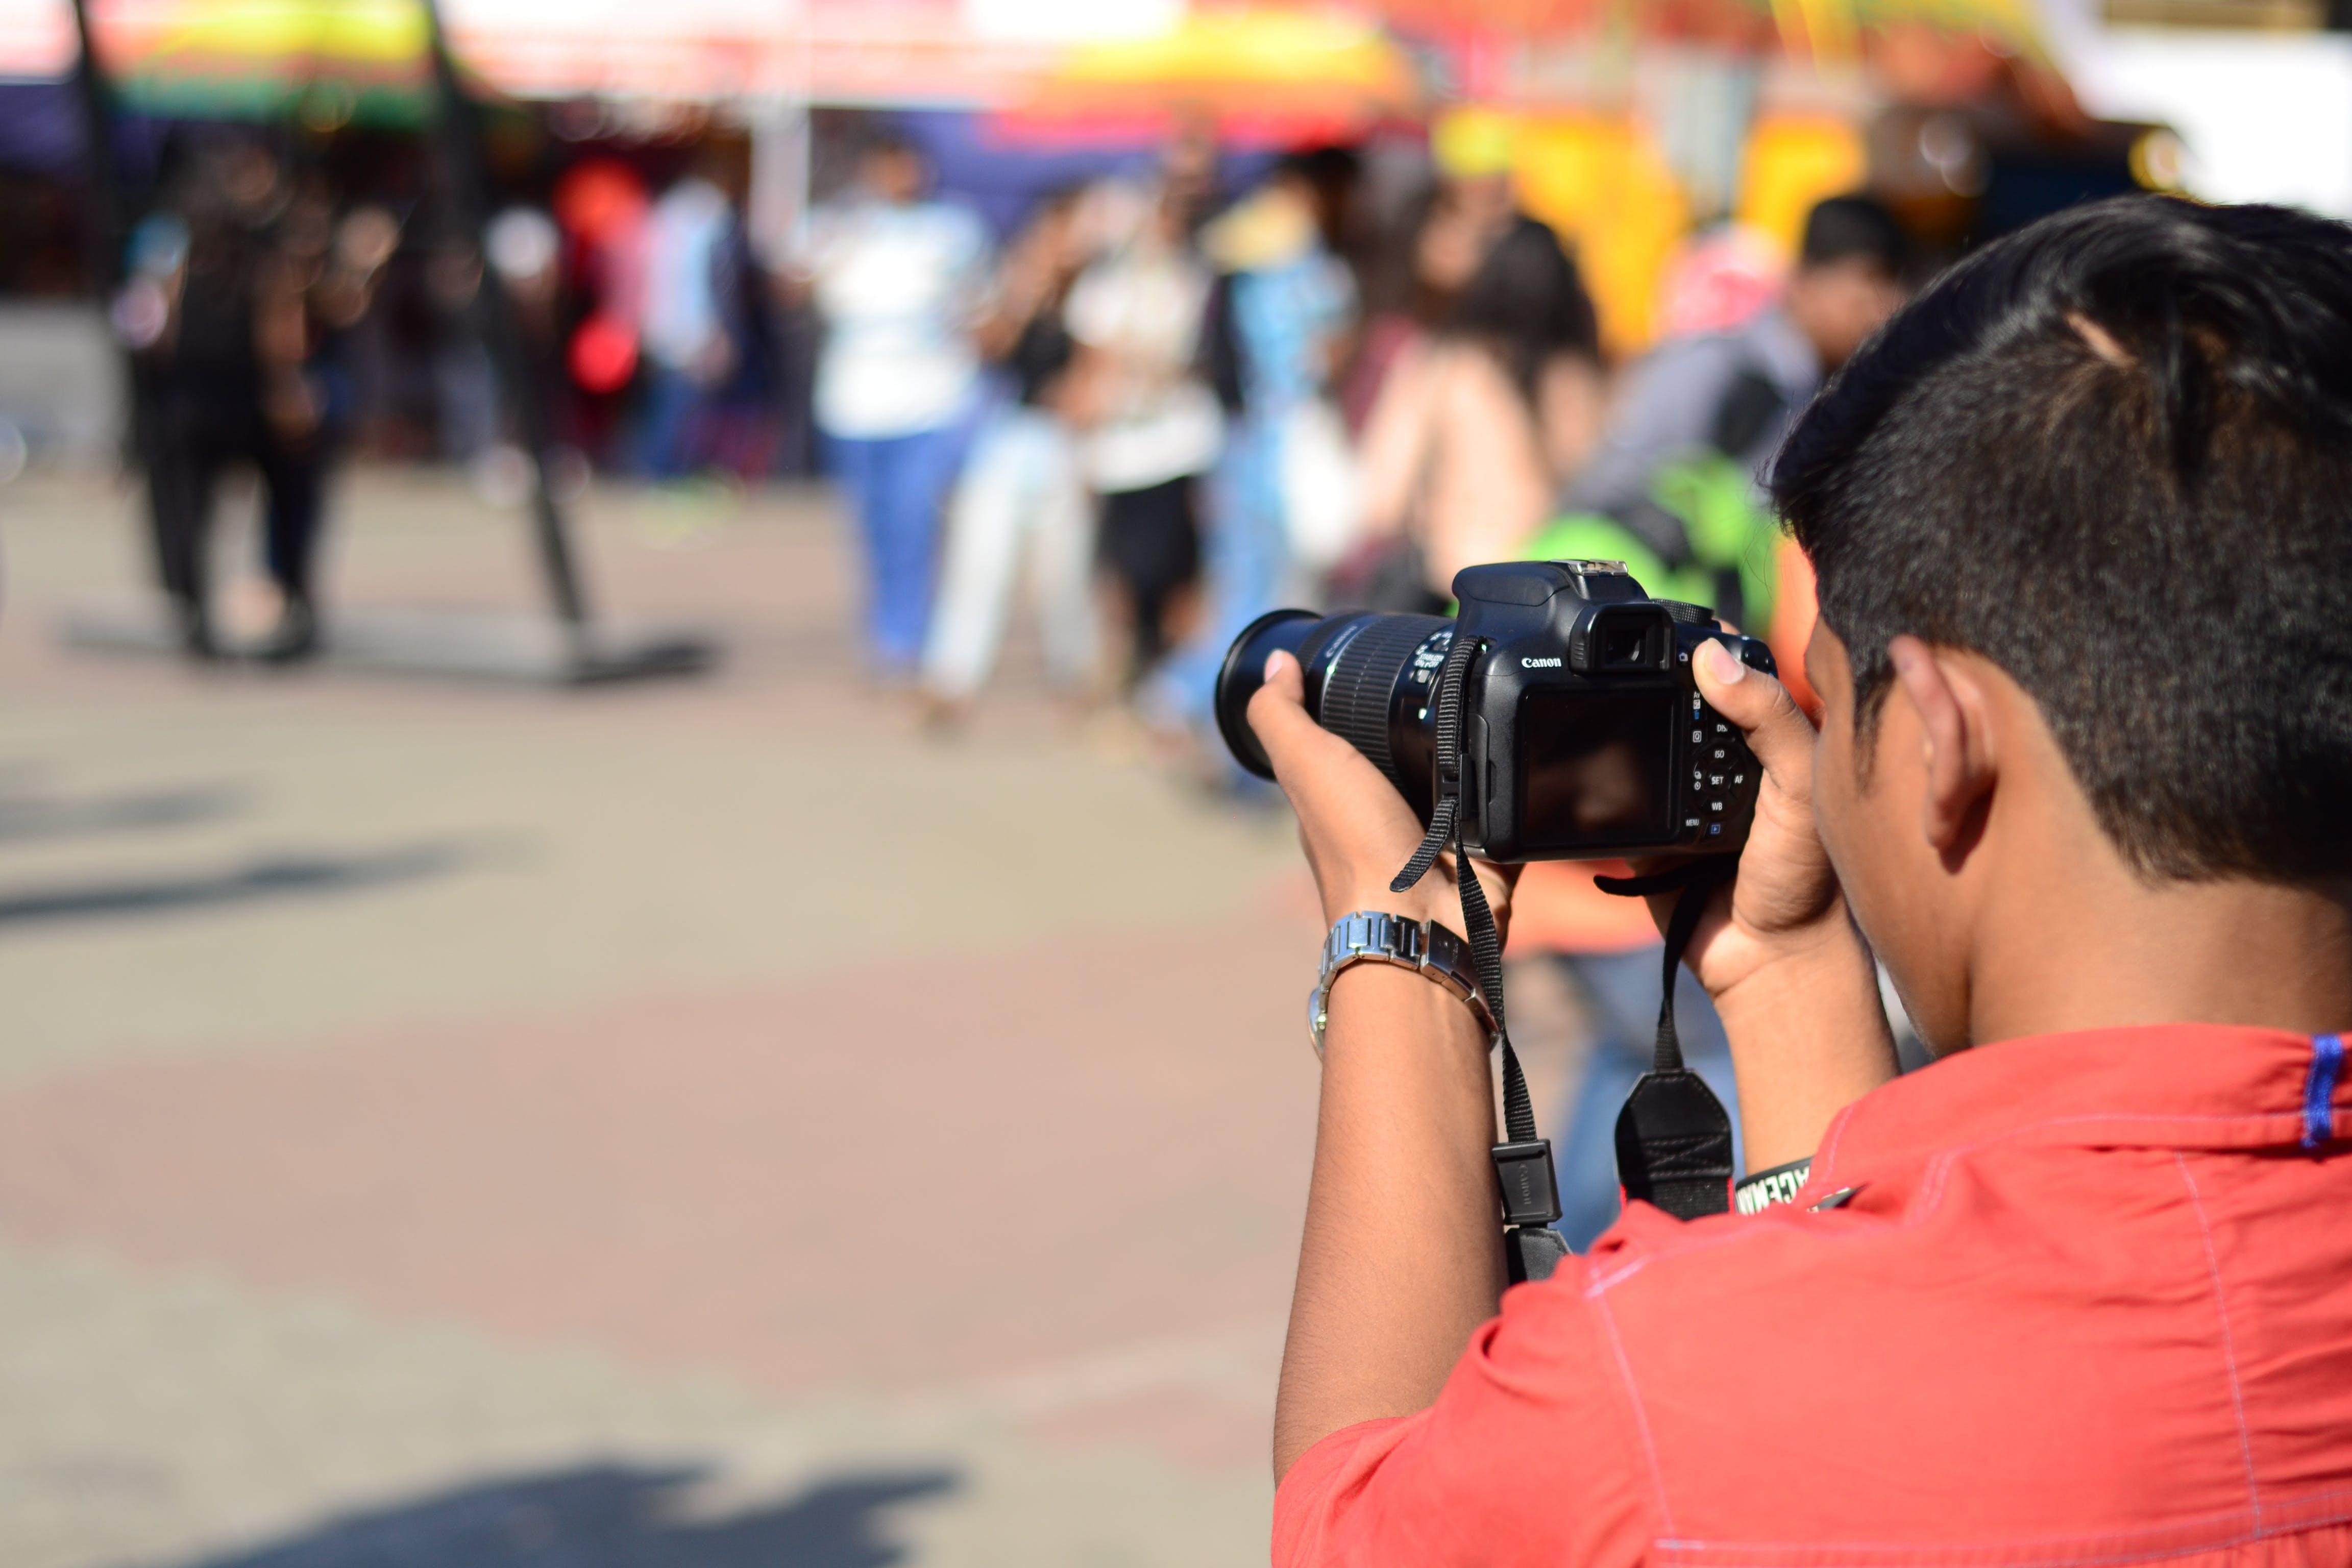 Free stock photo of camera, photographer, recording, photoshoot